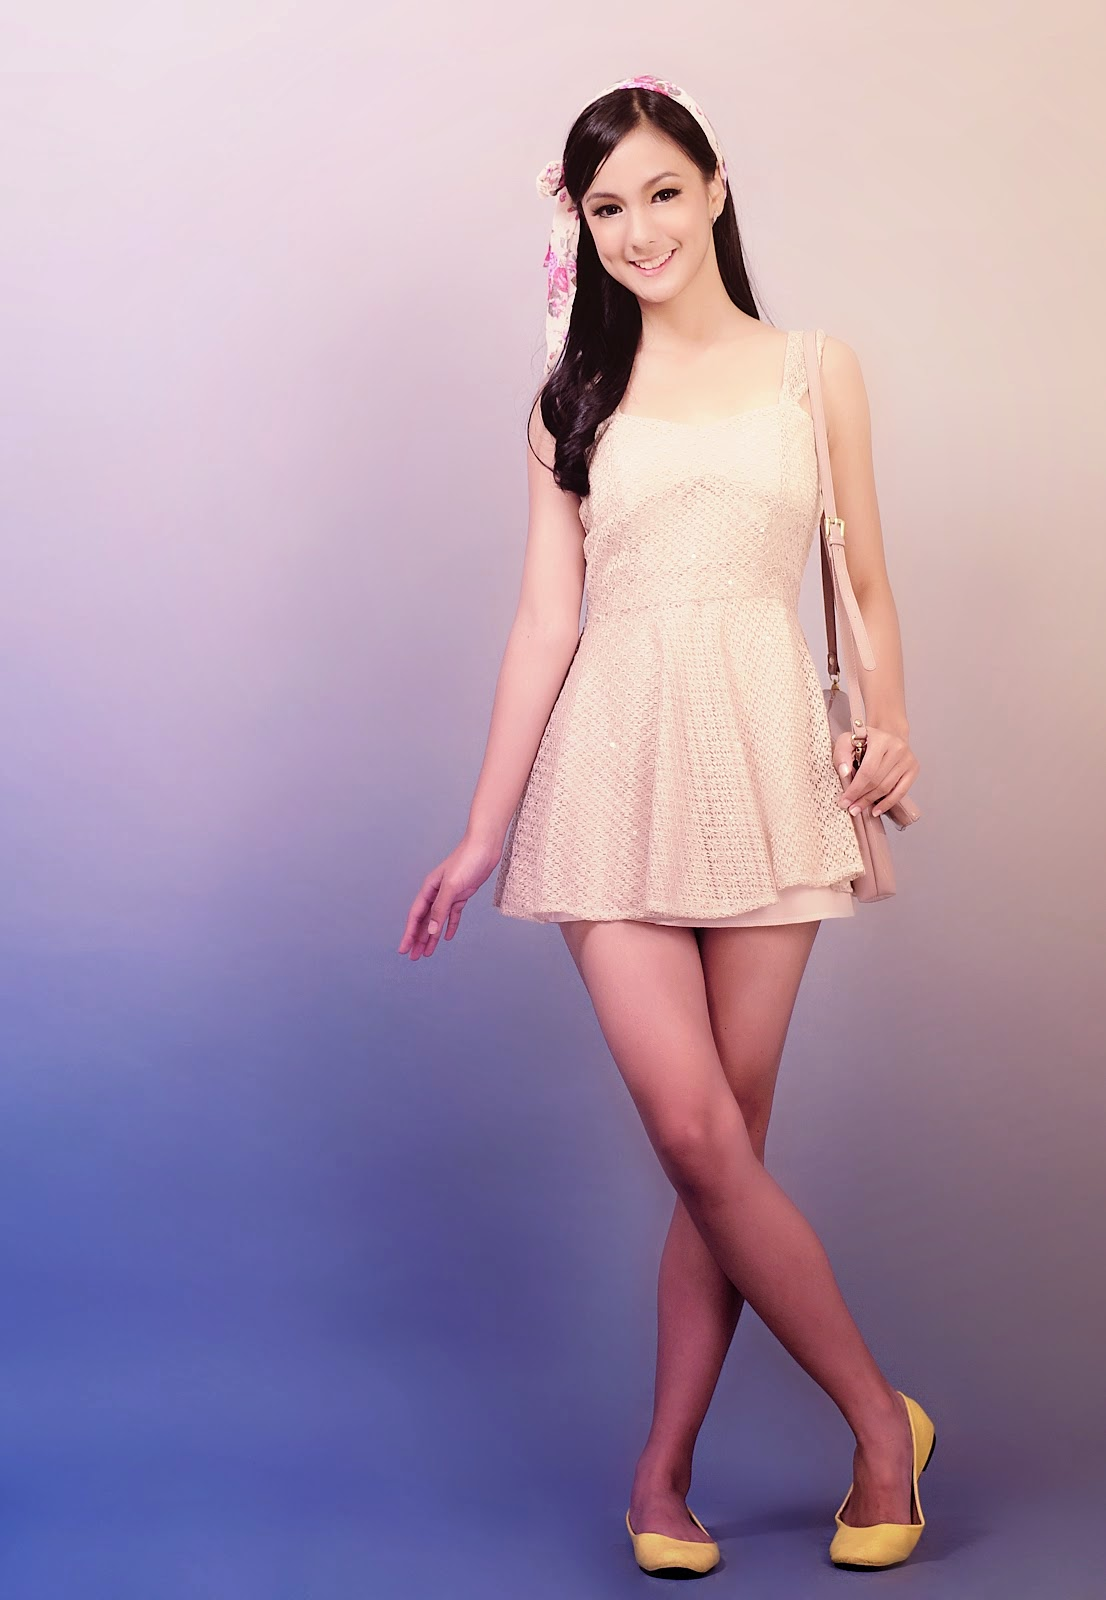 foto artis muda cantik Nasya Marcella